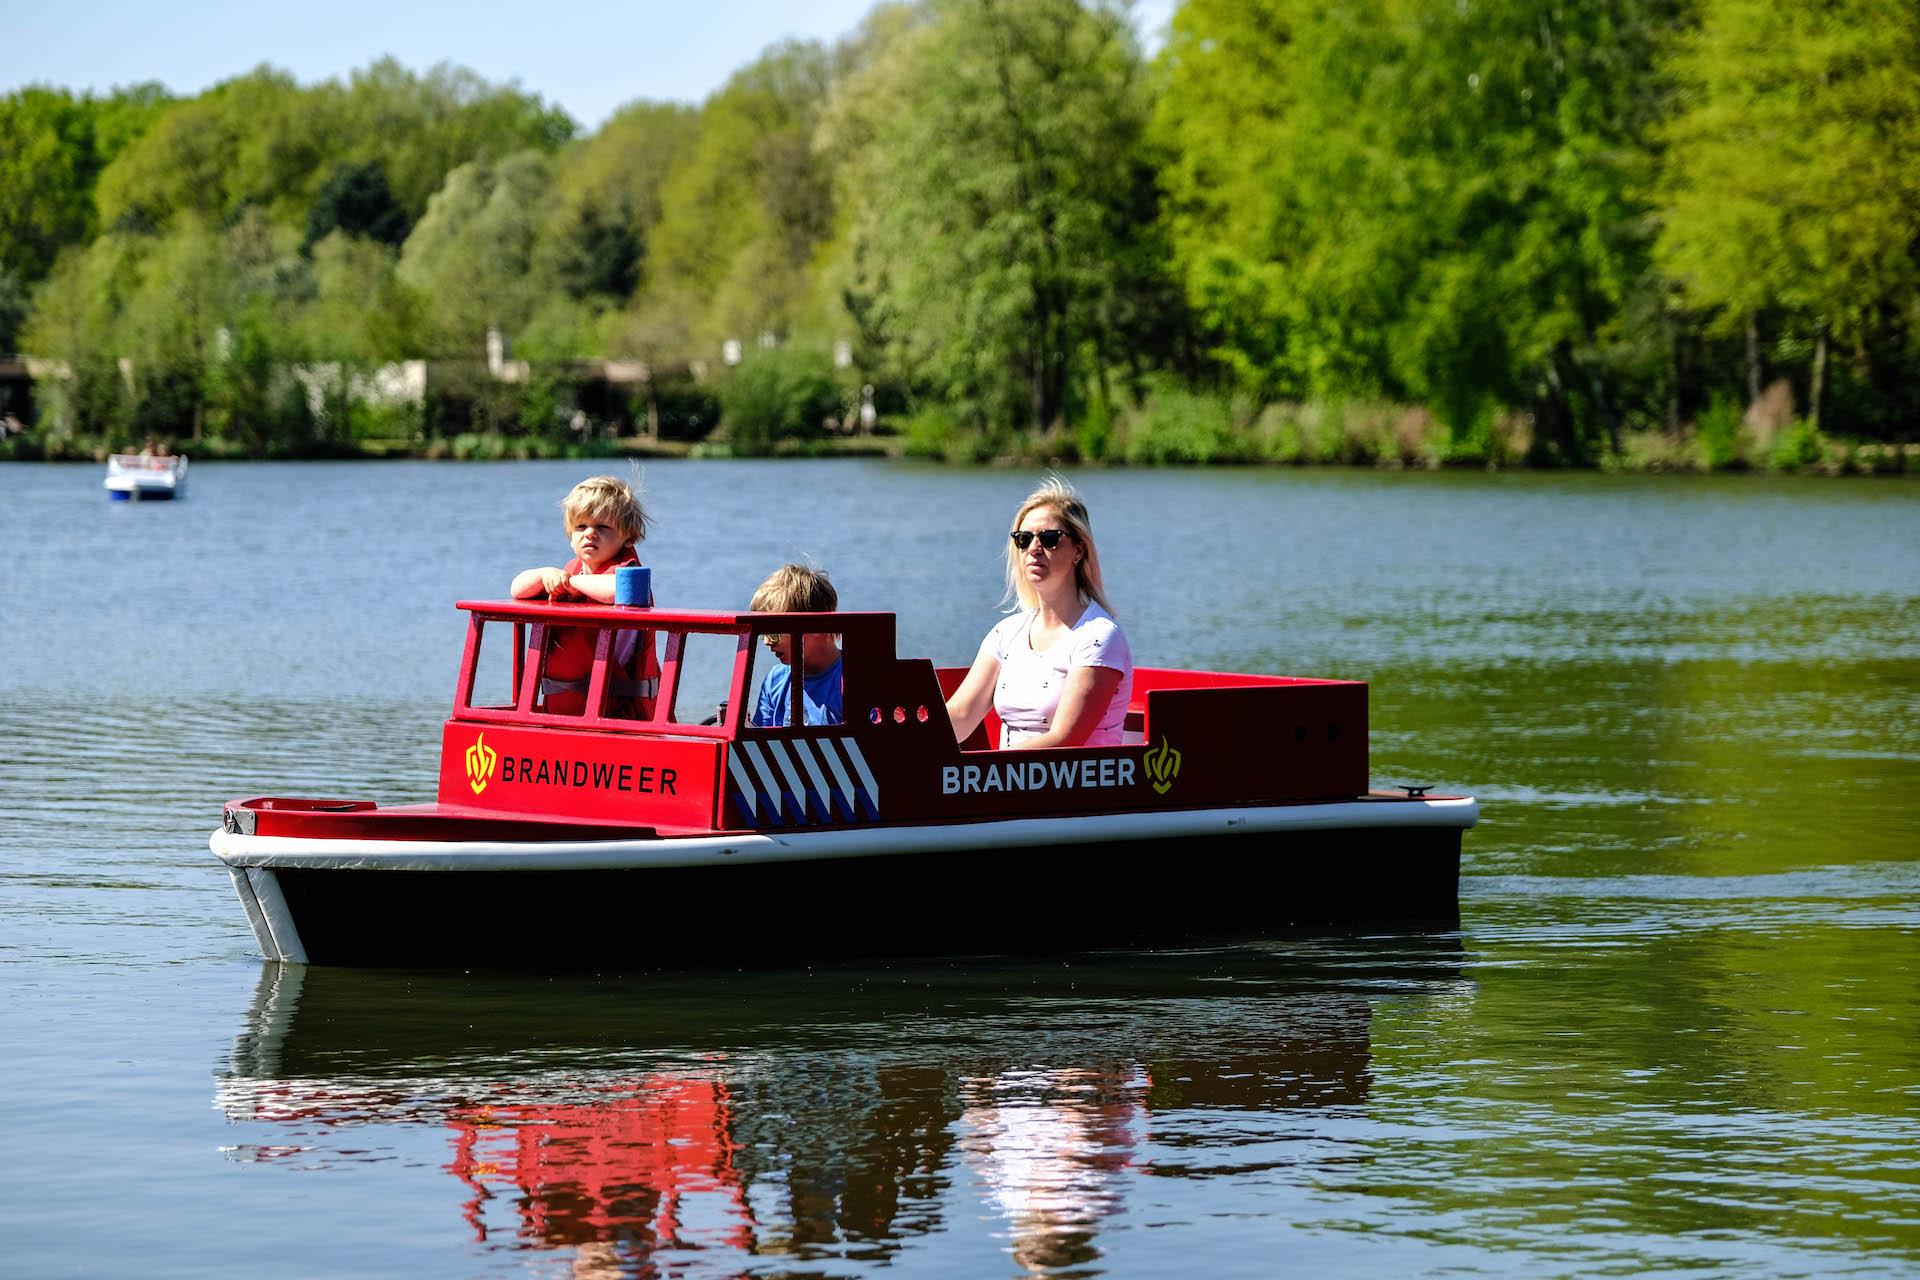 Miniportworld: fantastic themed boats.